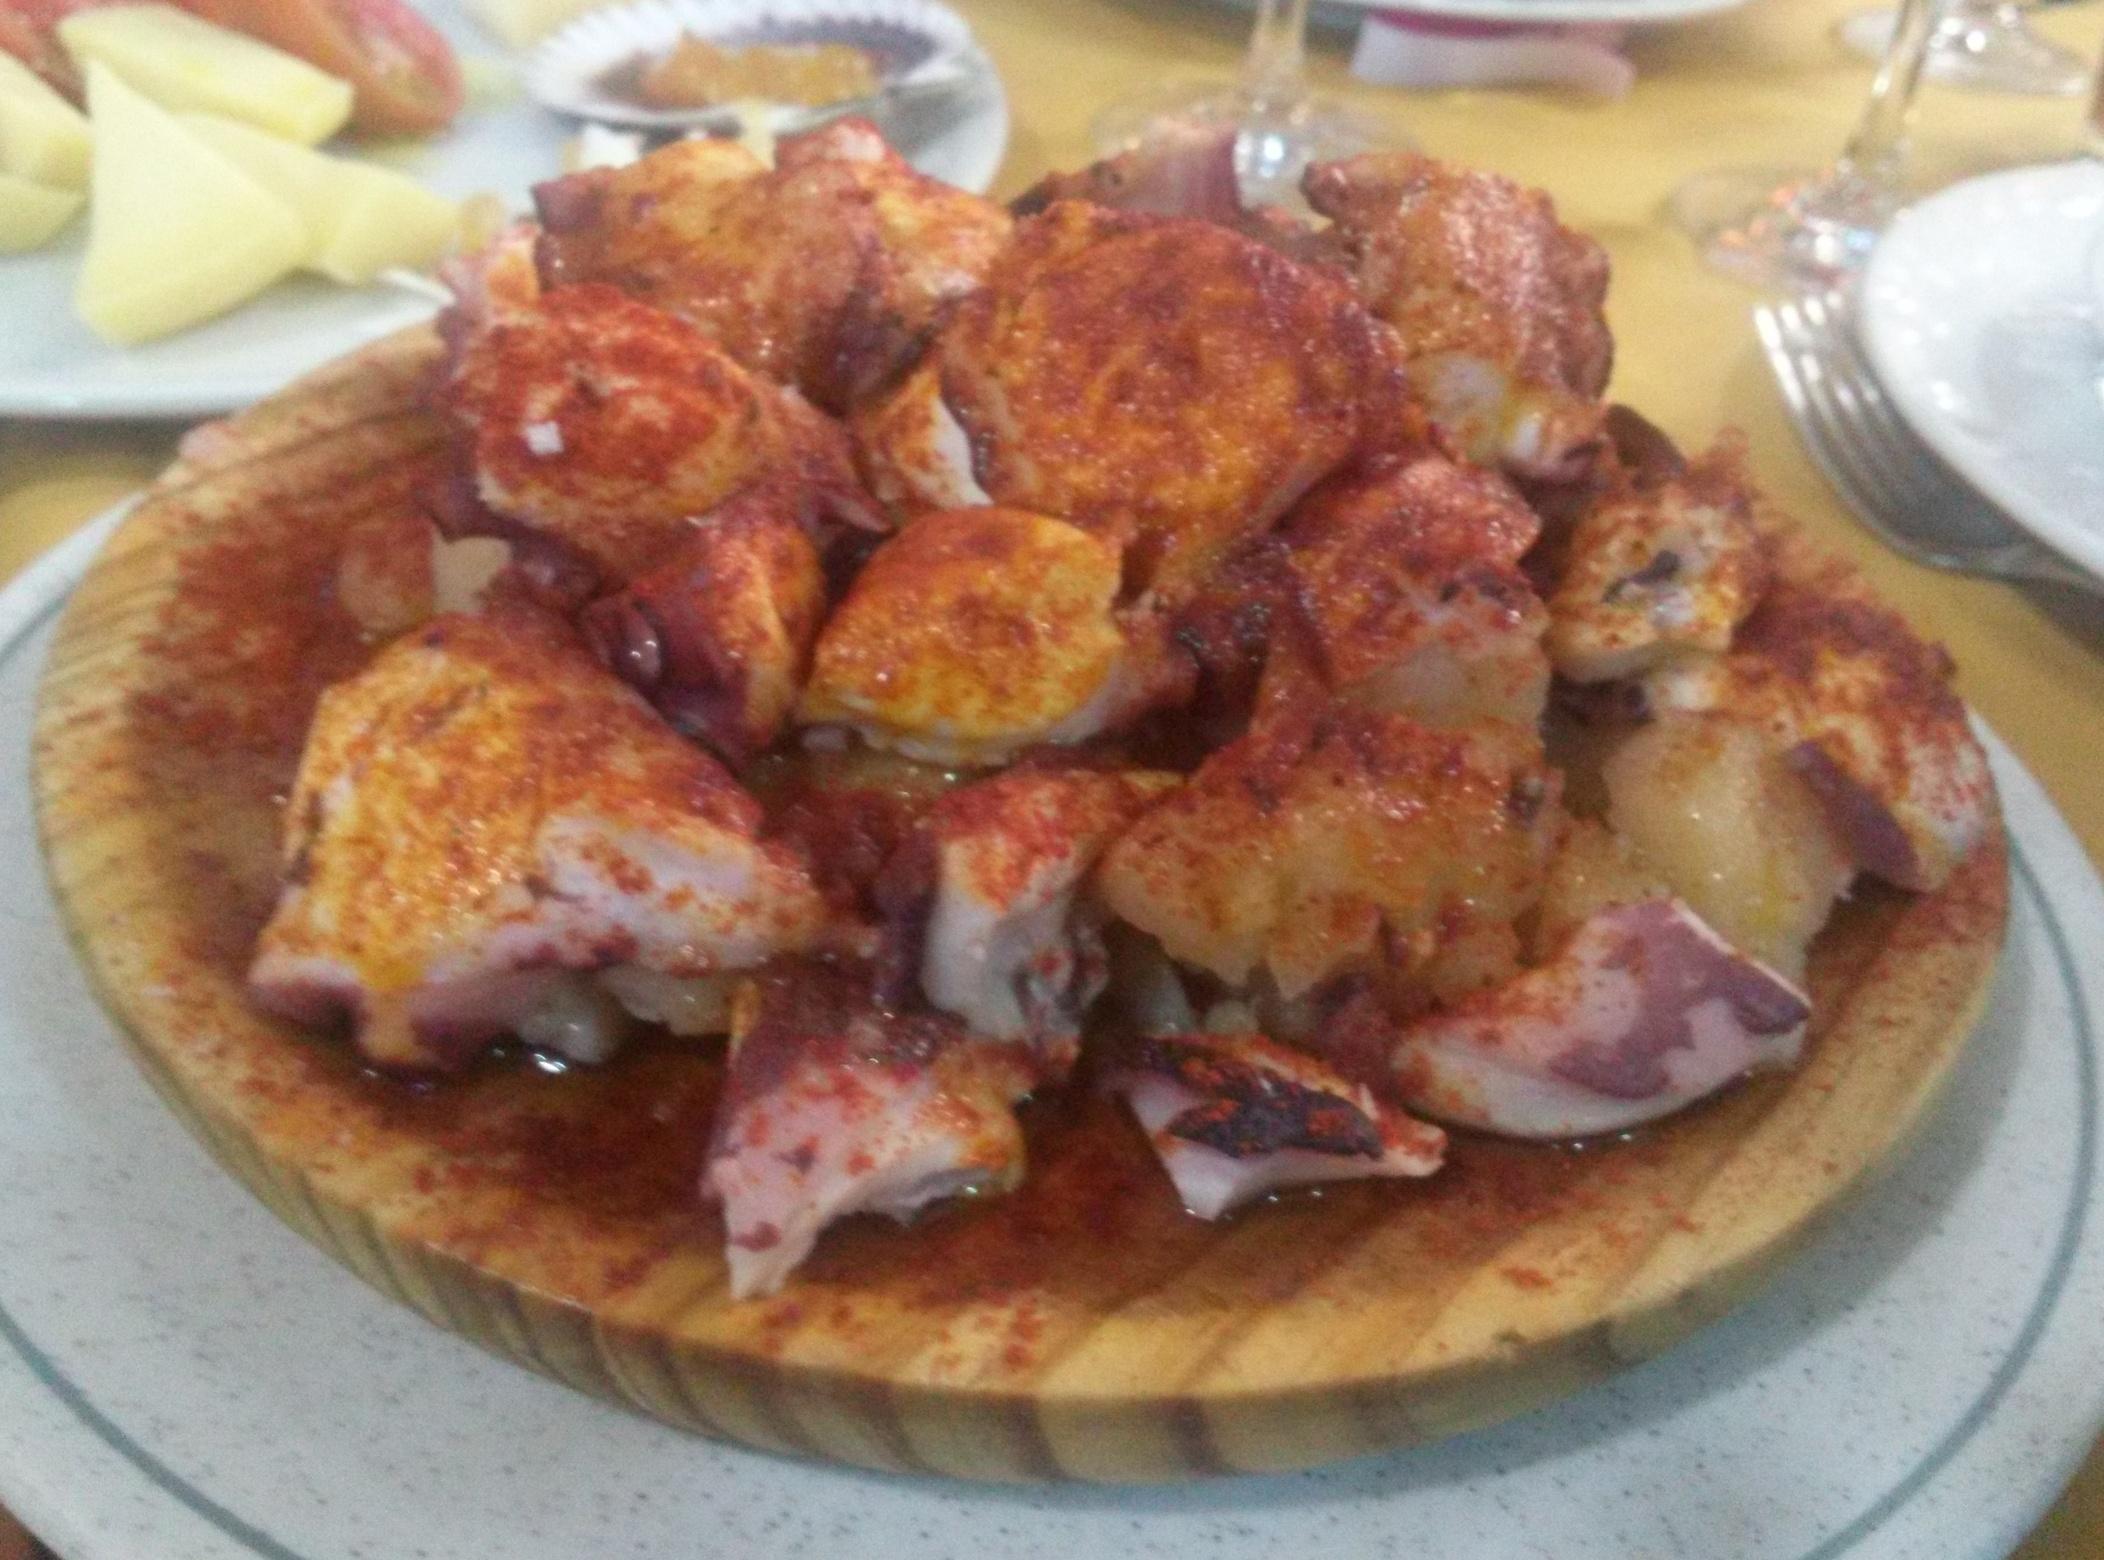 Pulpo a la gallega en O' Peregrino Bizarro, comida 25 febrero, postcata Jerez